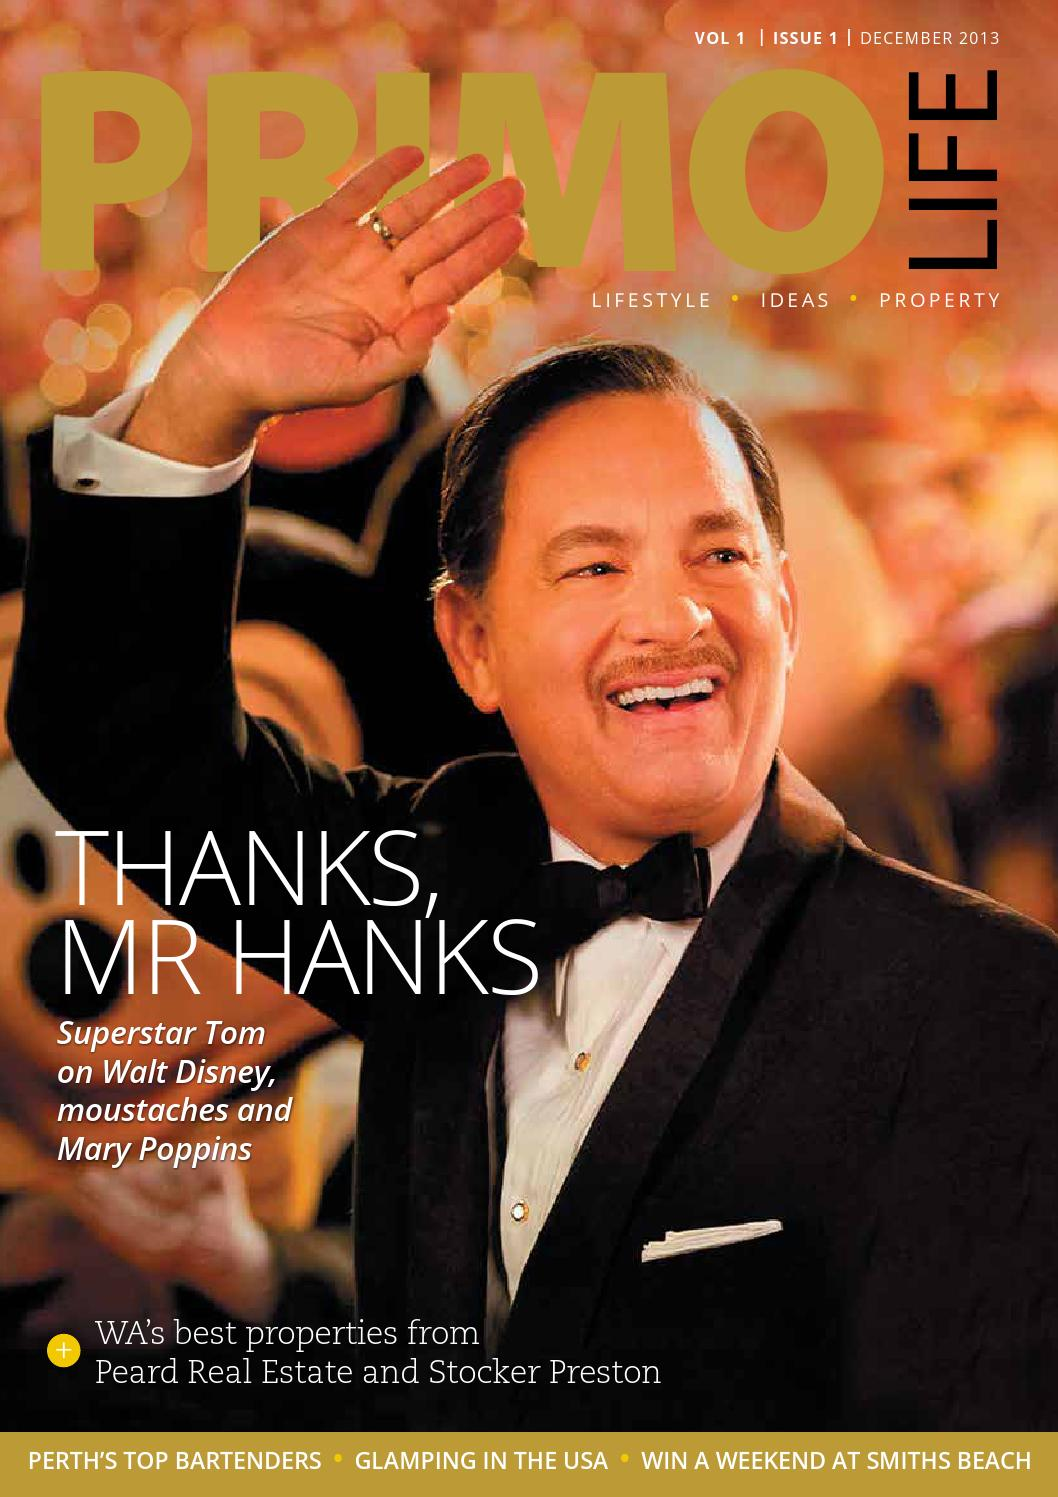 PRIMOLife December 2013 by Premium Publishers - issuu